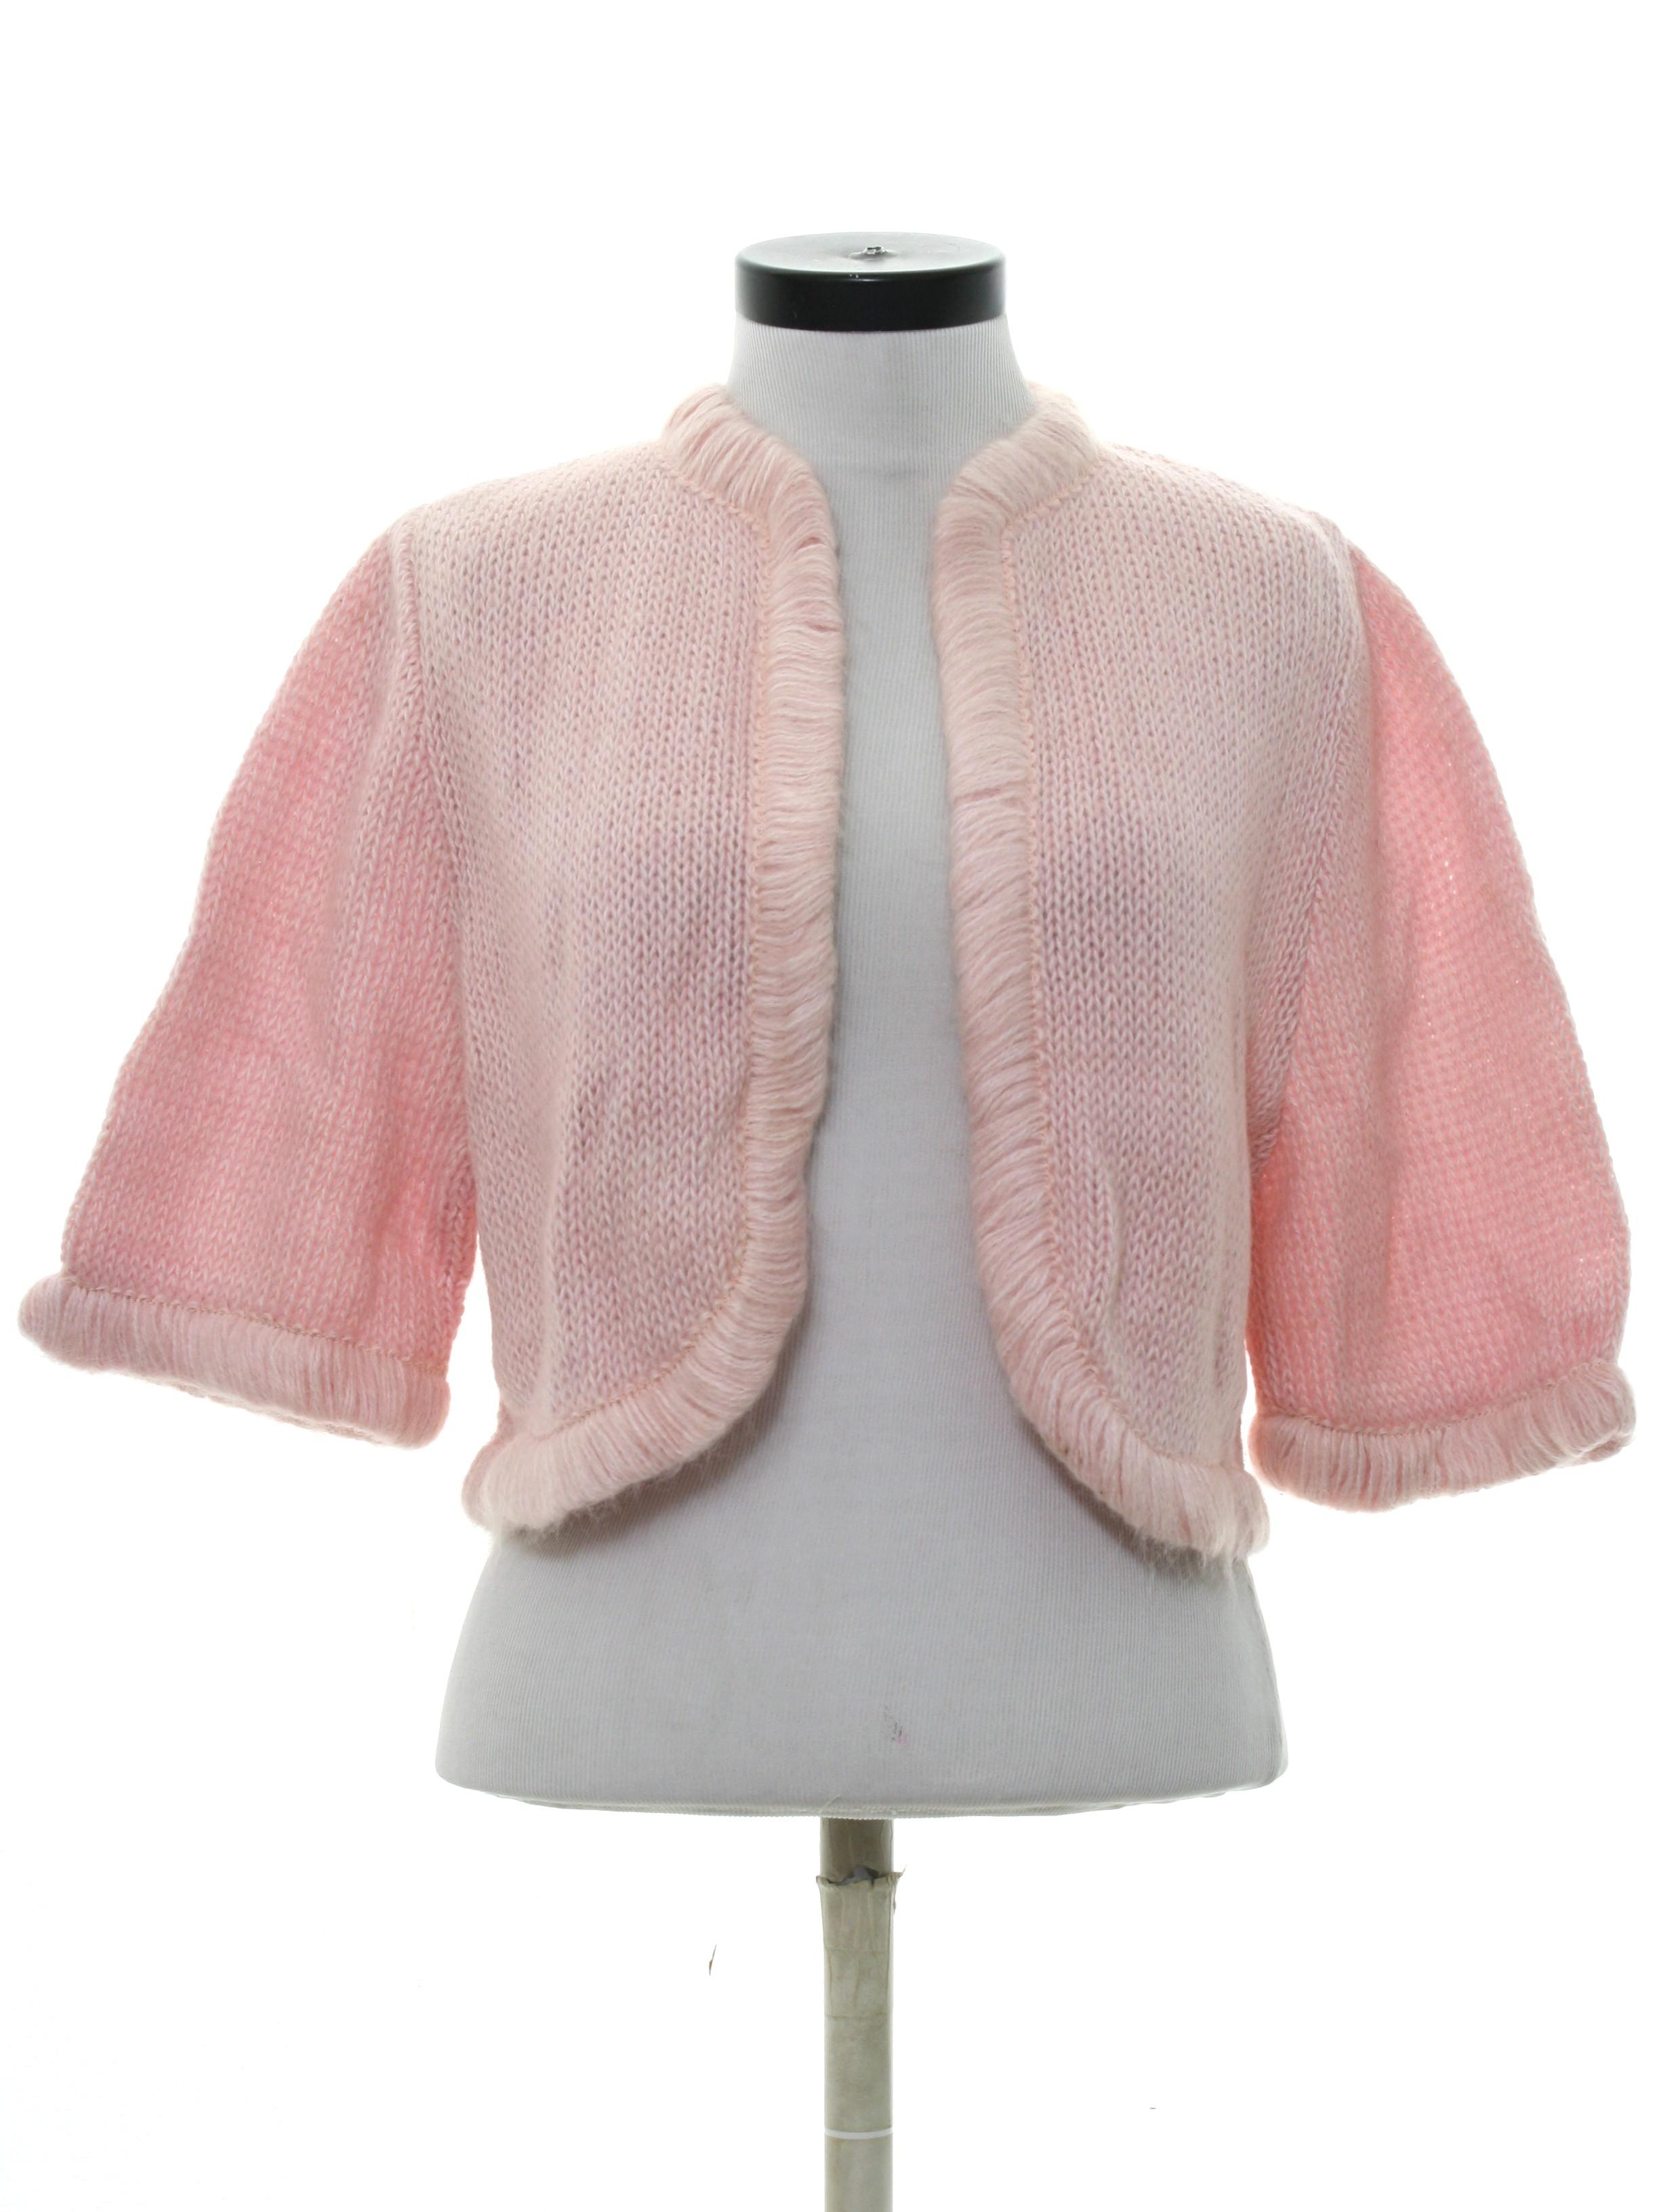 Retro Sixties Sweater 60s Neiman Marcus Womens Soft Pink